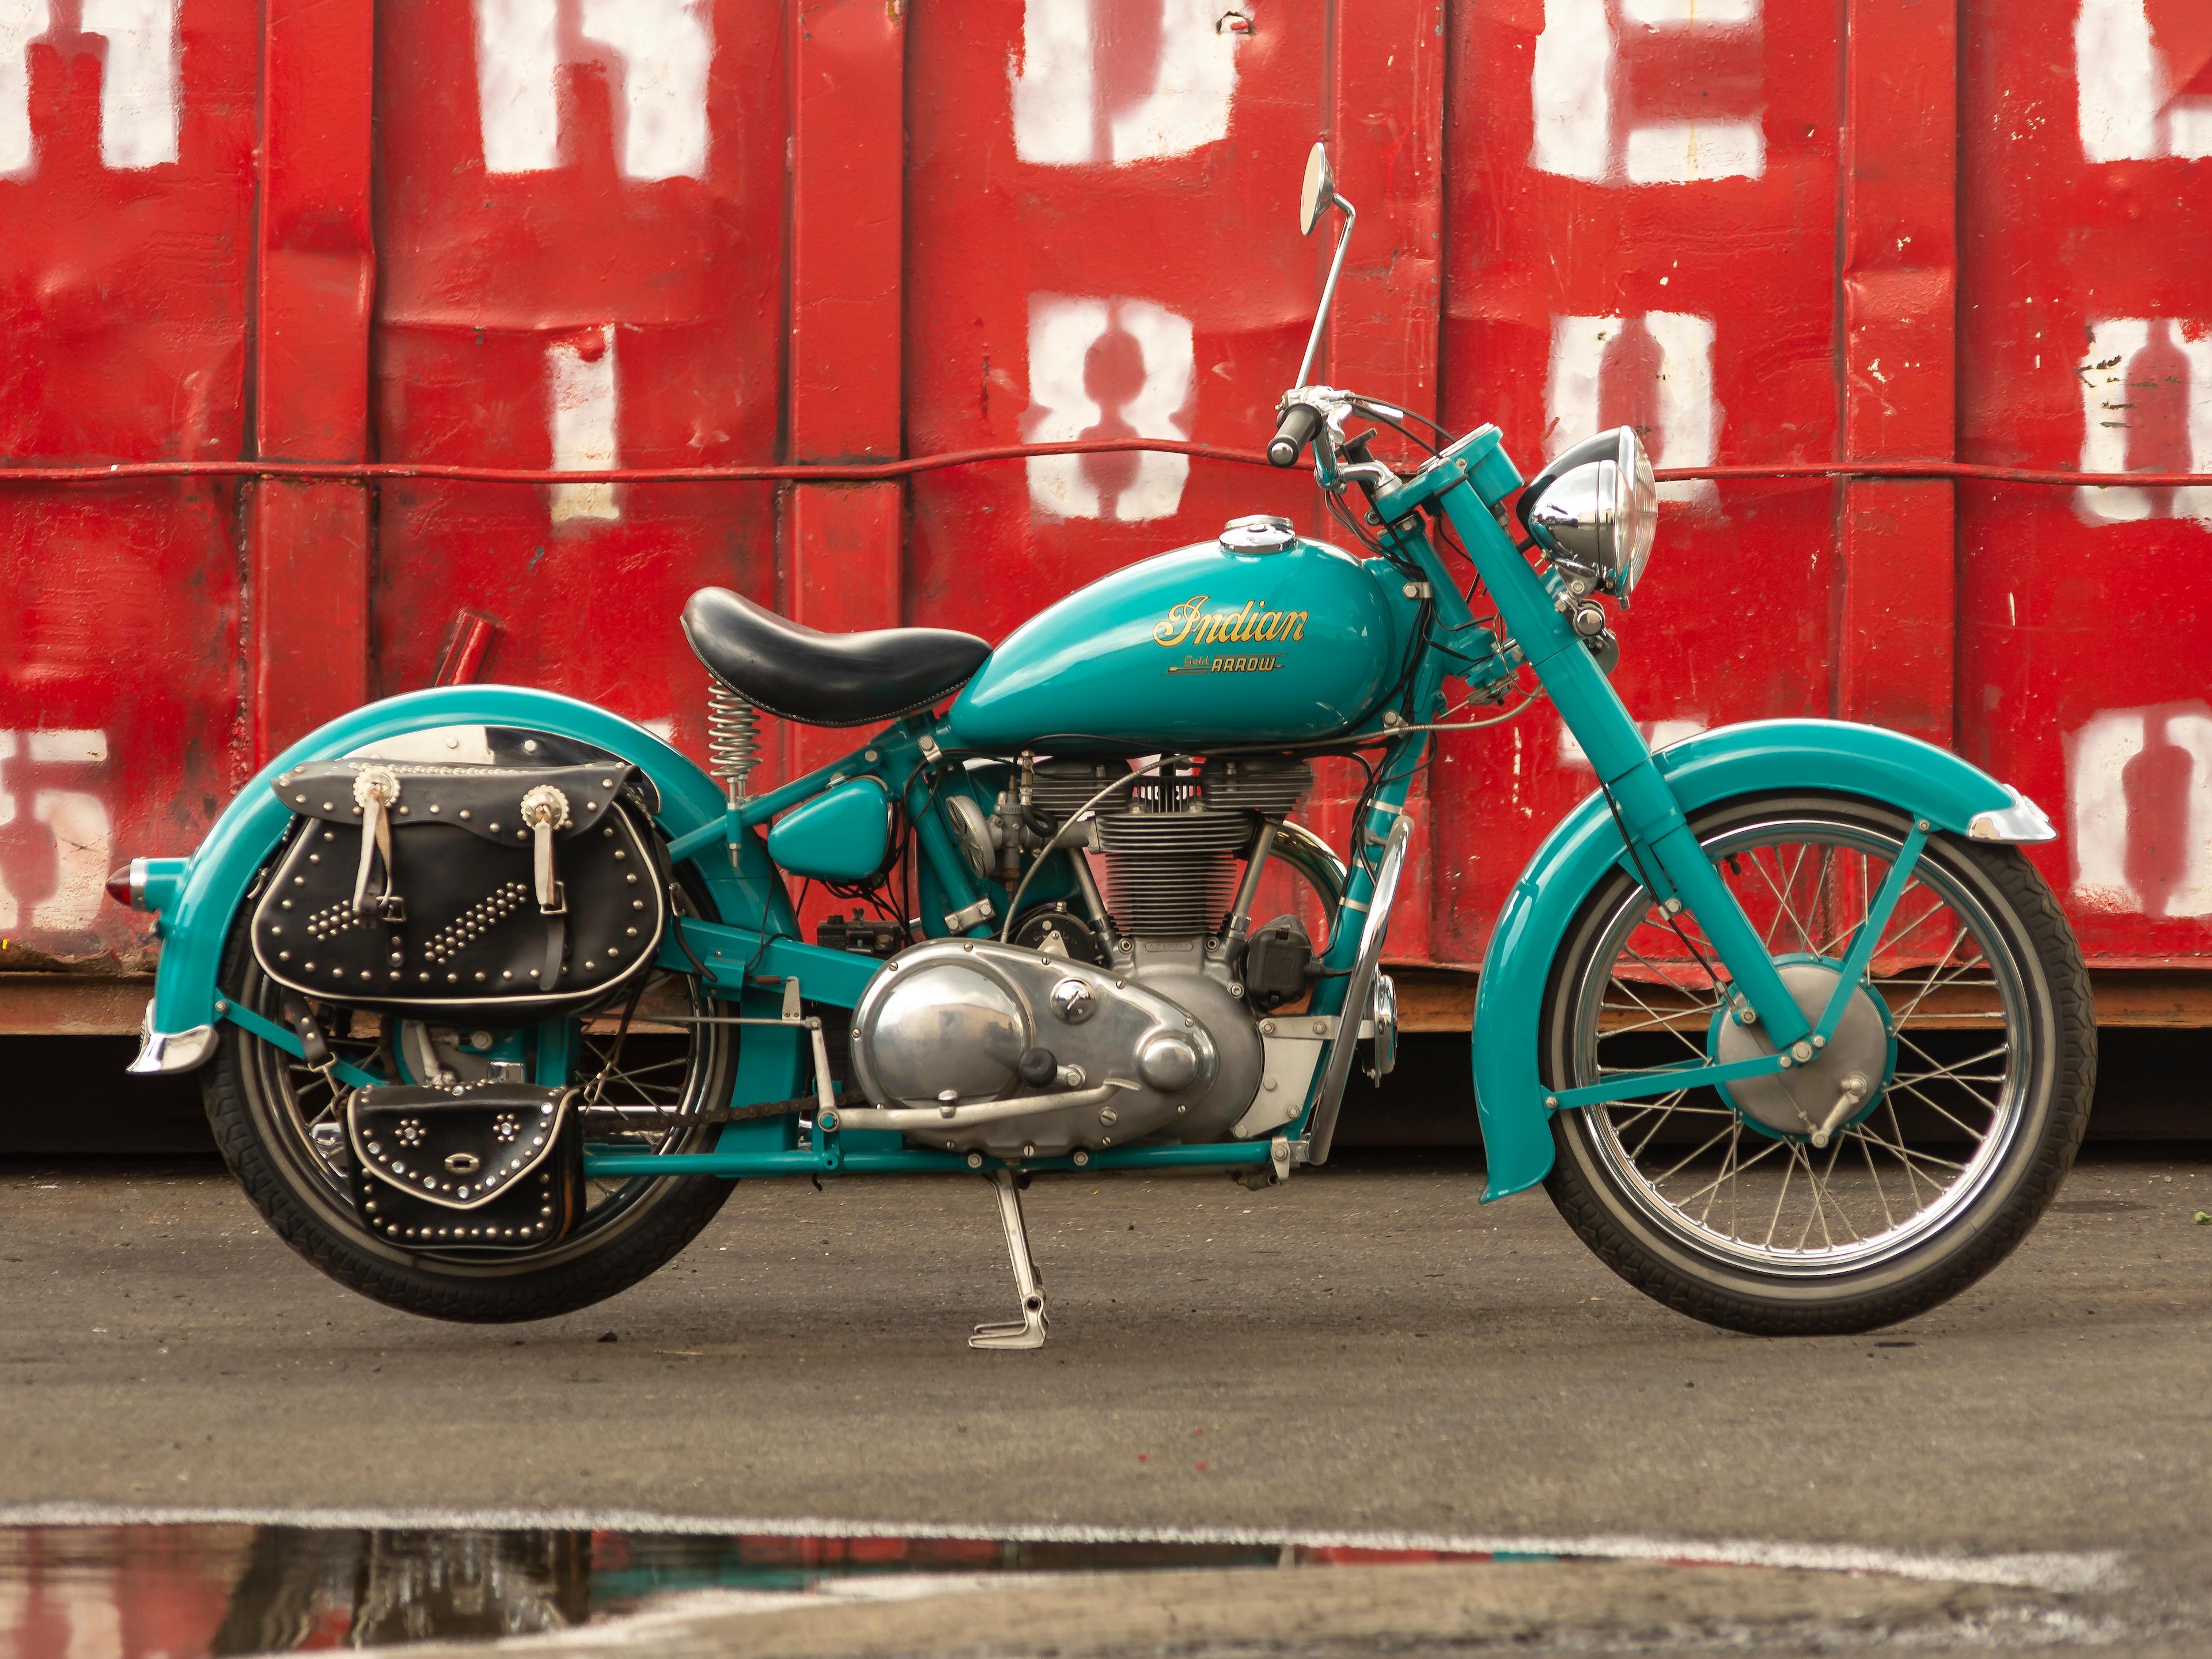 1949 Indian 220cc Gold Arrow Engine no. AD13988